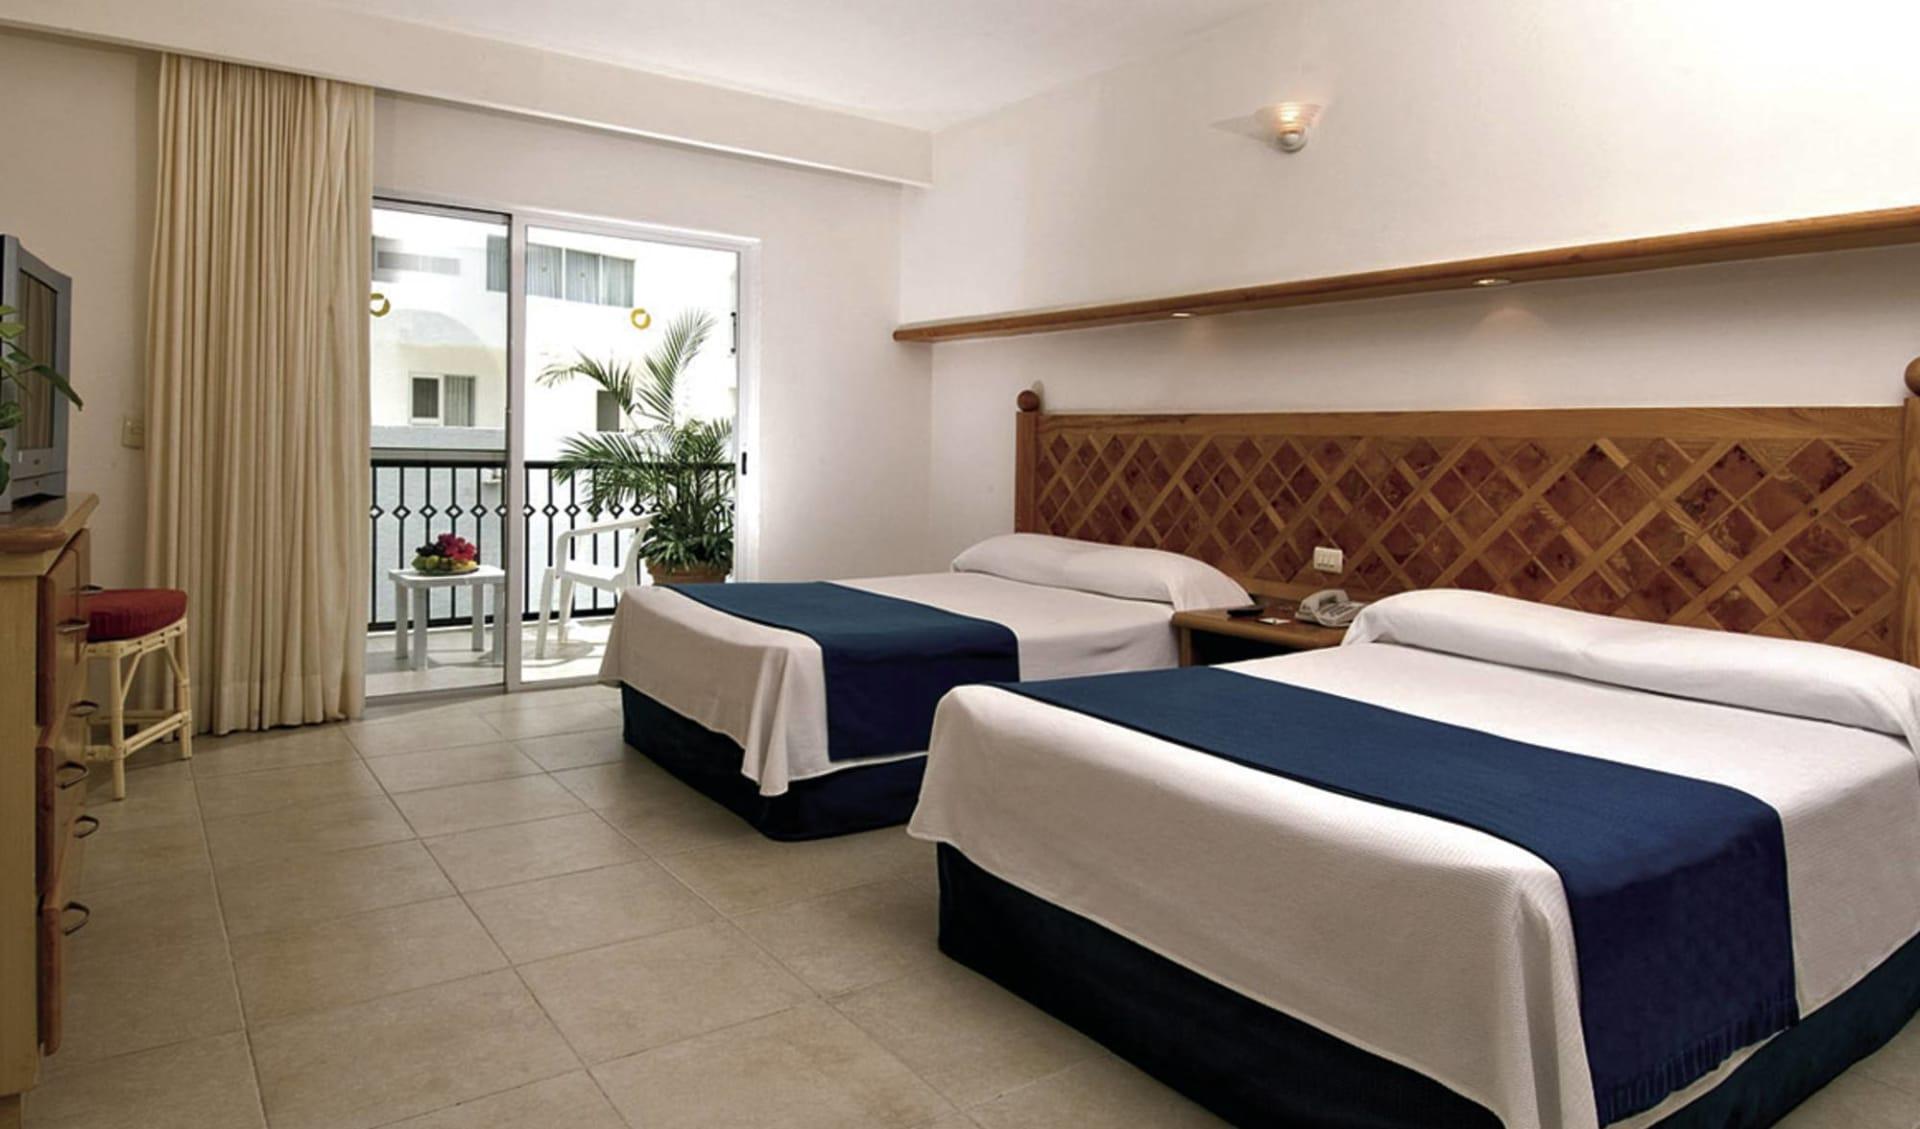 Beachscape Kin Ha Villas & Suites in Cancun: zimmer beachscape kin ha villas and suites twinbed zimmer